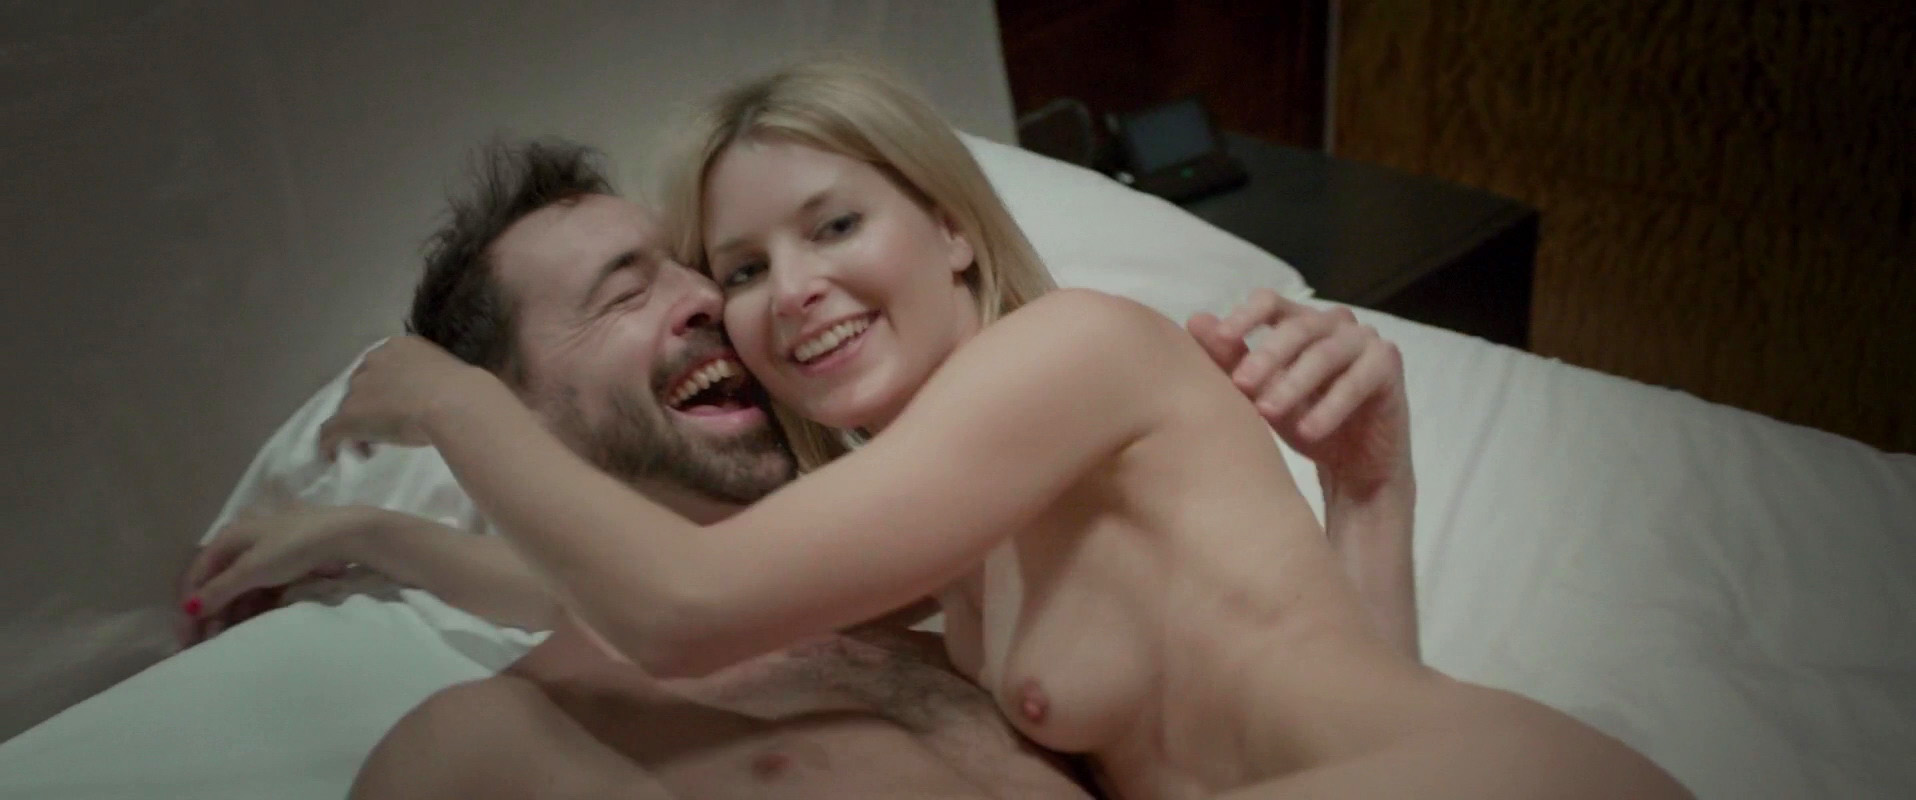 Beckensale scene kate sex